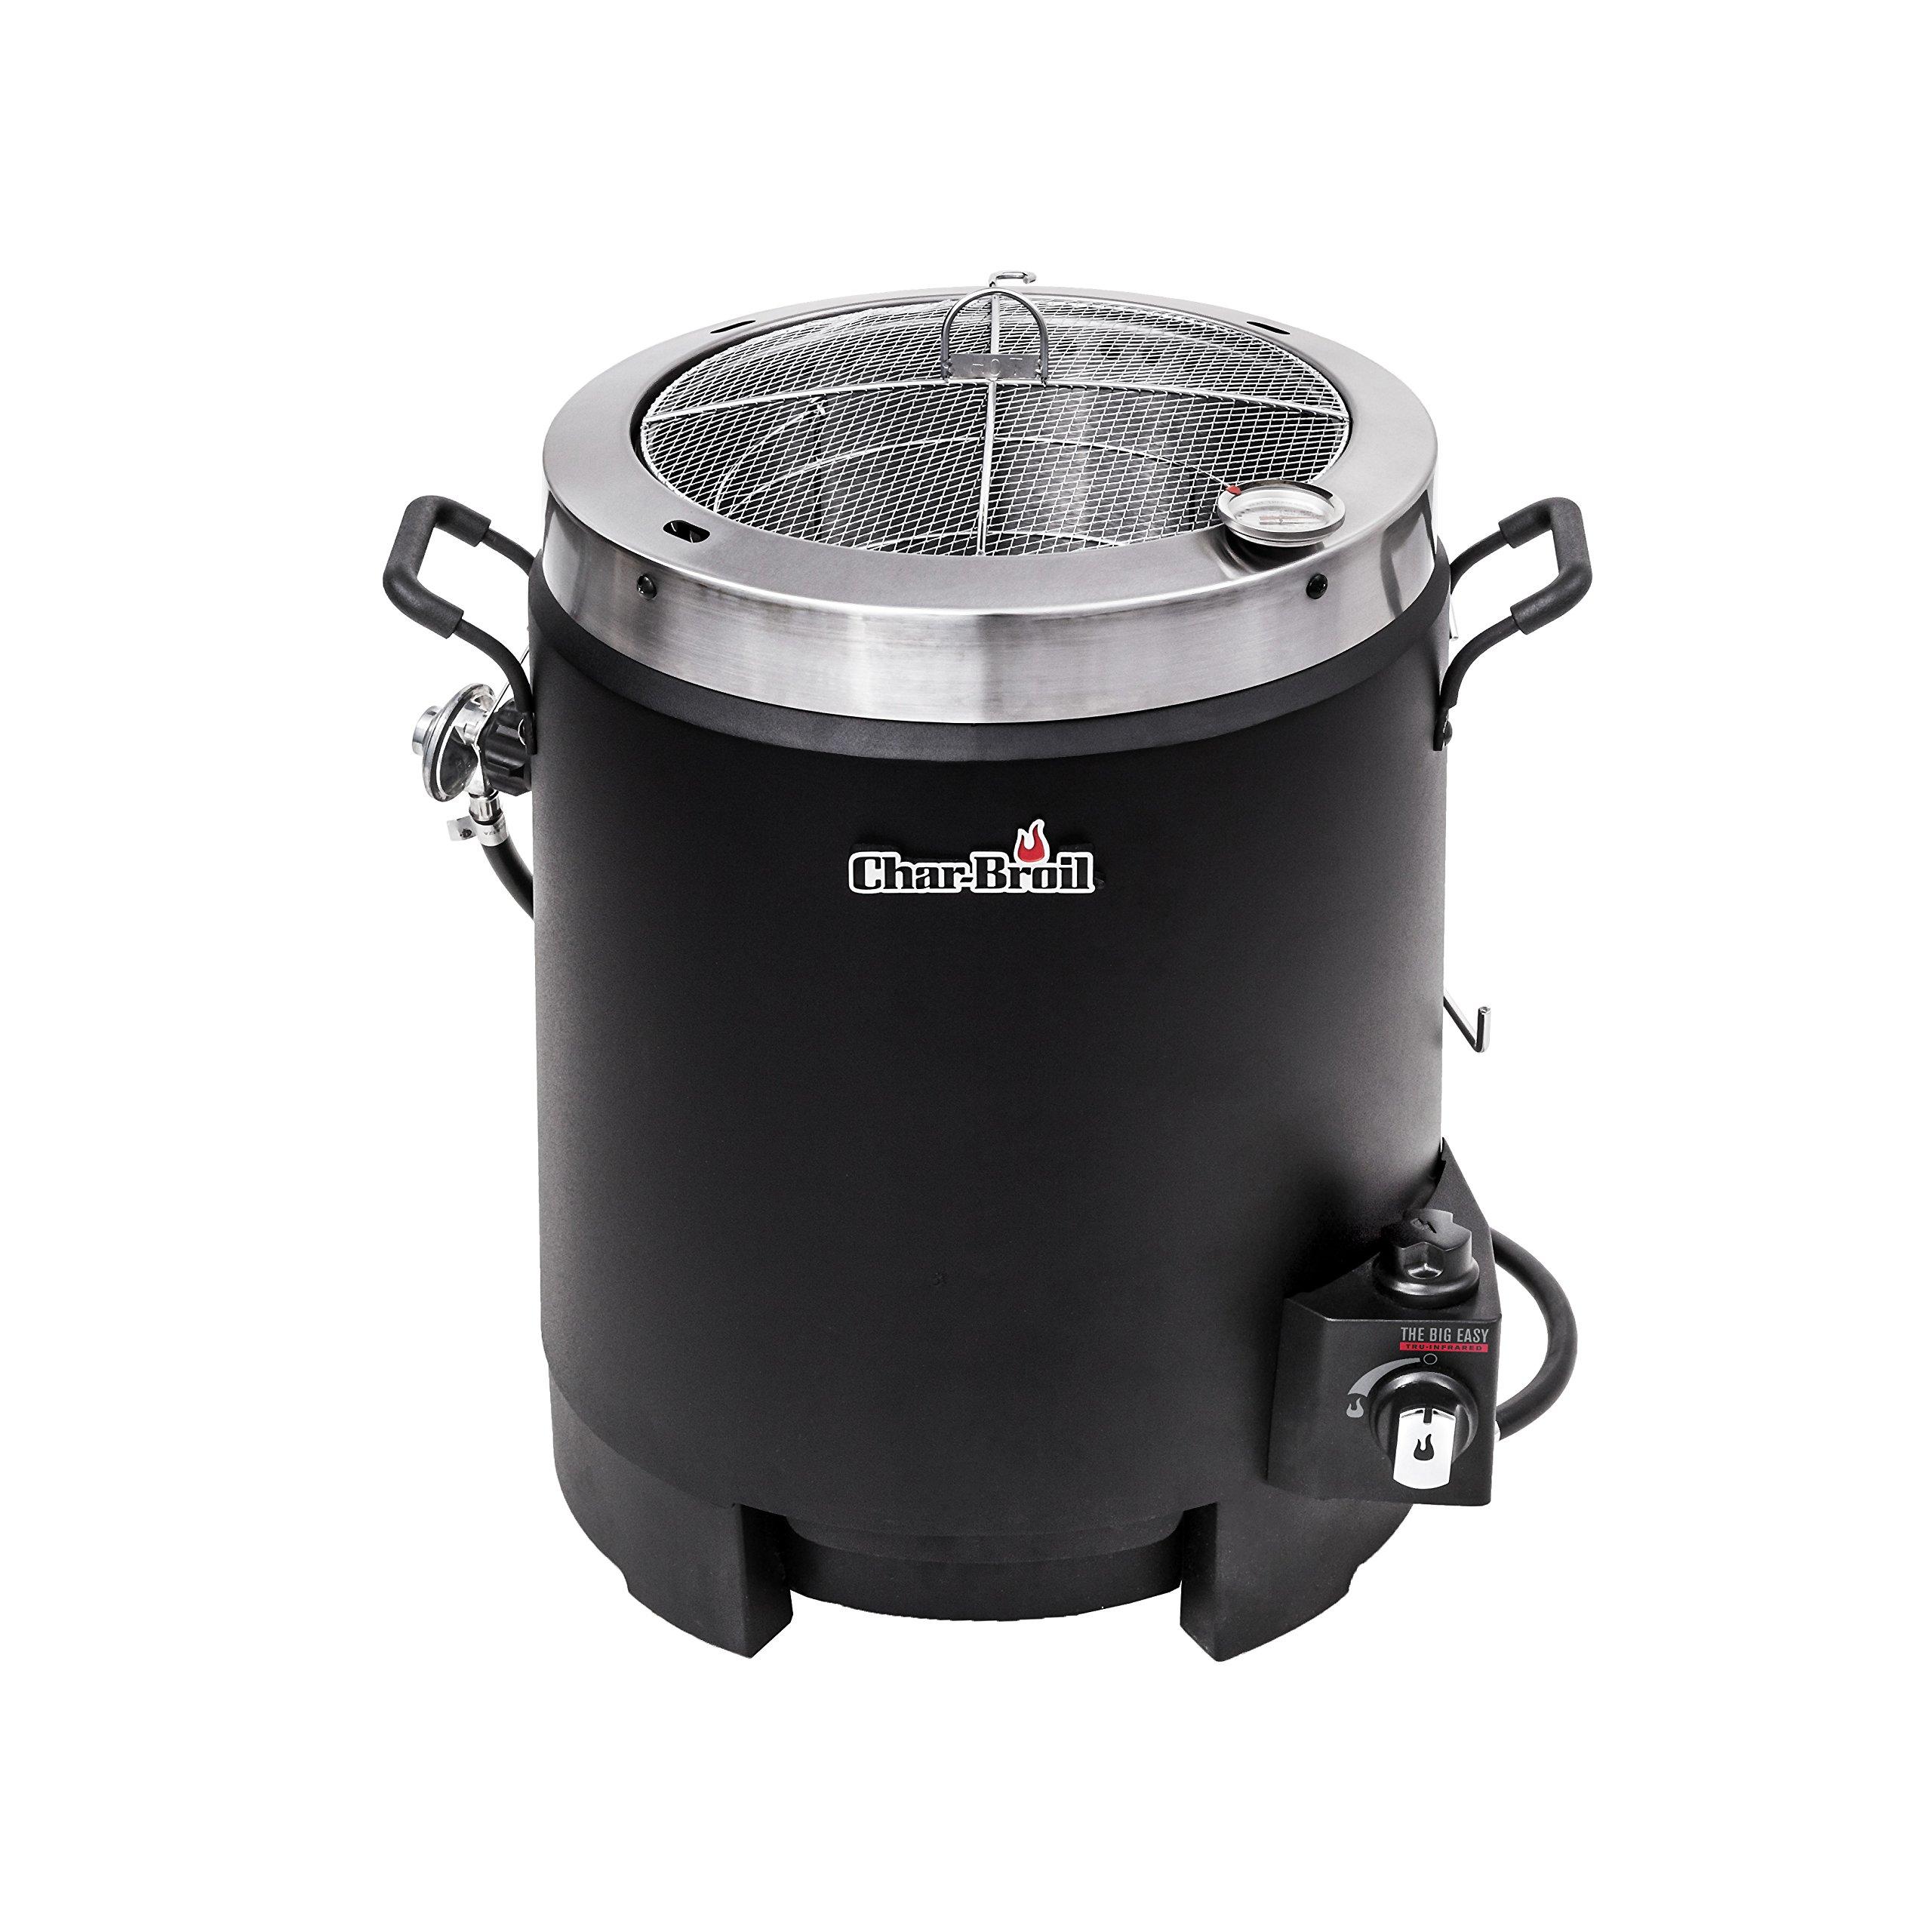 Char-Broil Big Easy Oil-less Liquid Propane Turkey Fryer by Char-Broil